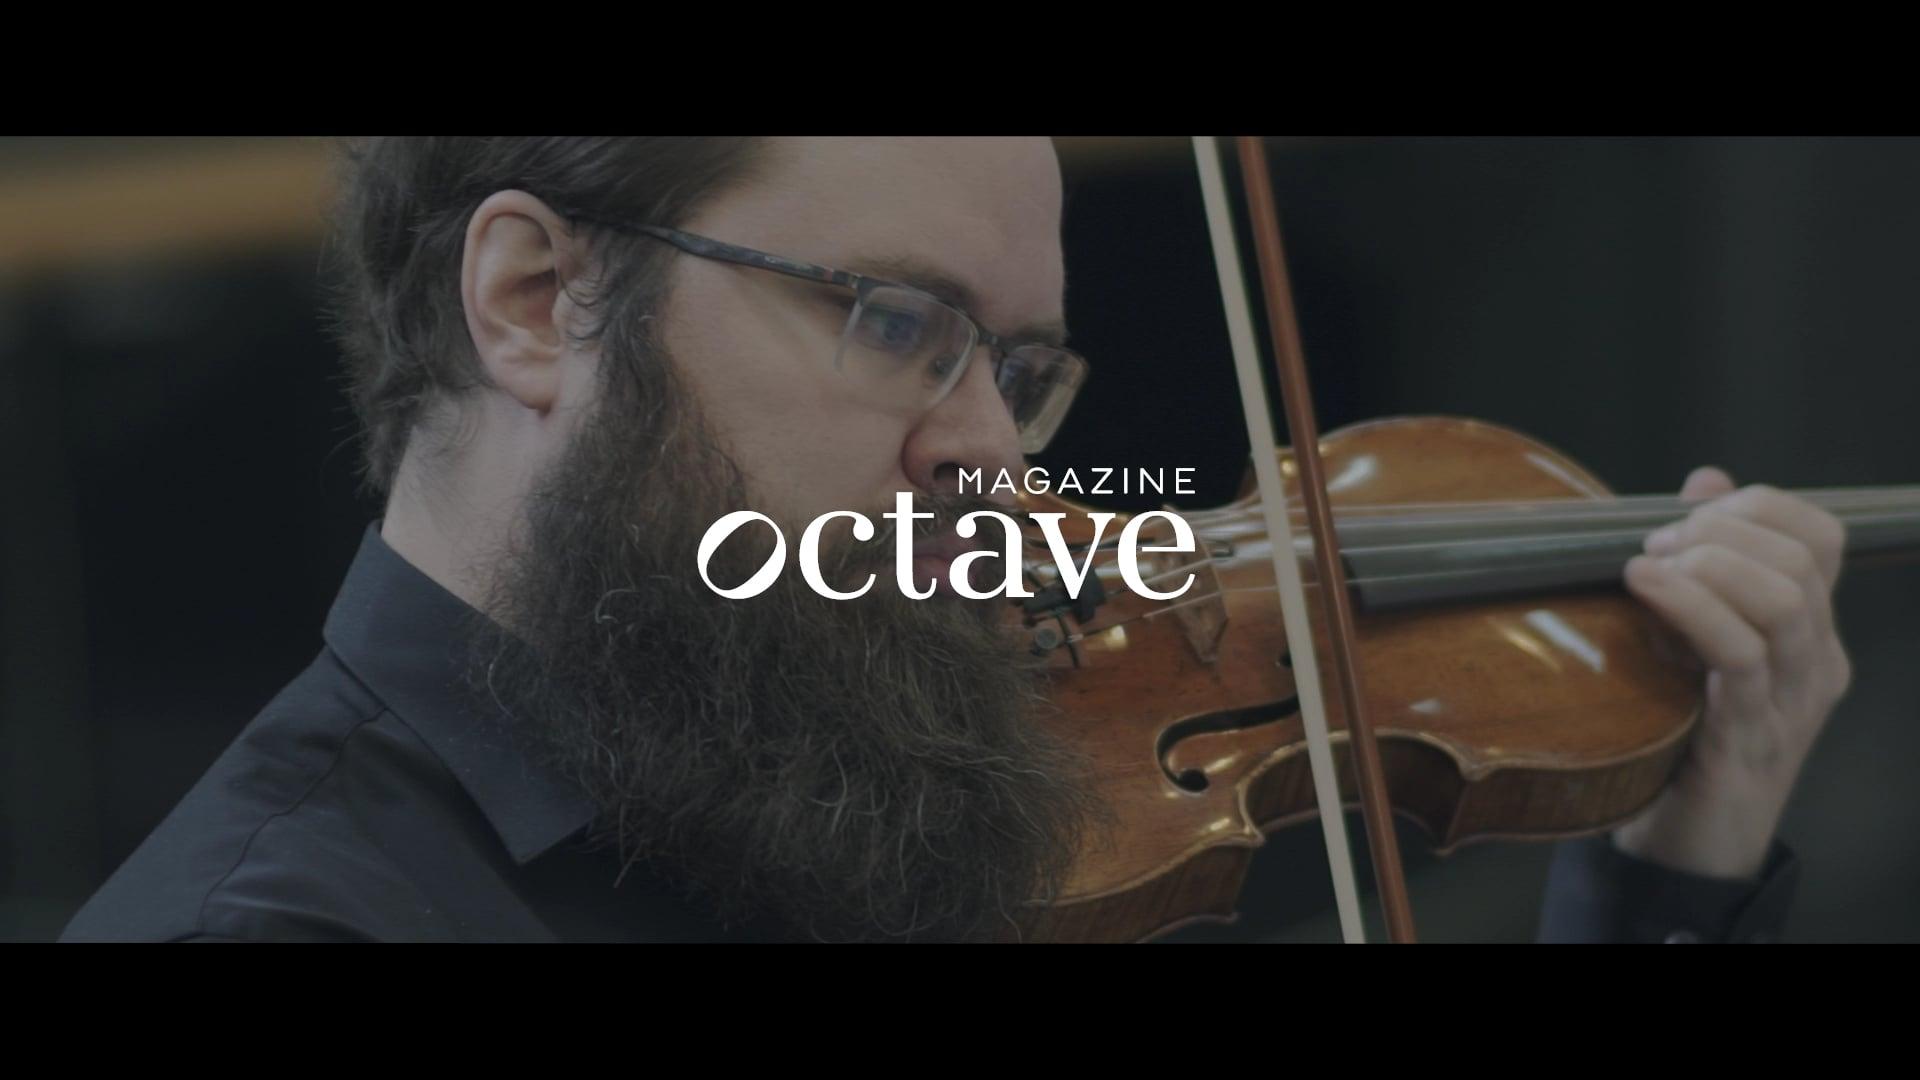 Opéra de Paris - Entretien avec Petteri Iivonen (2021)